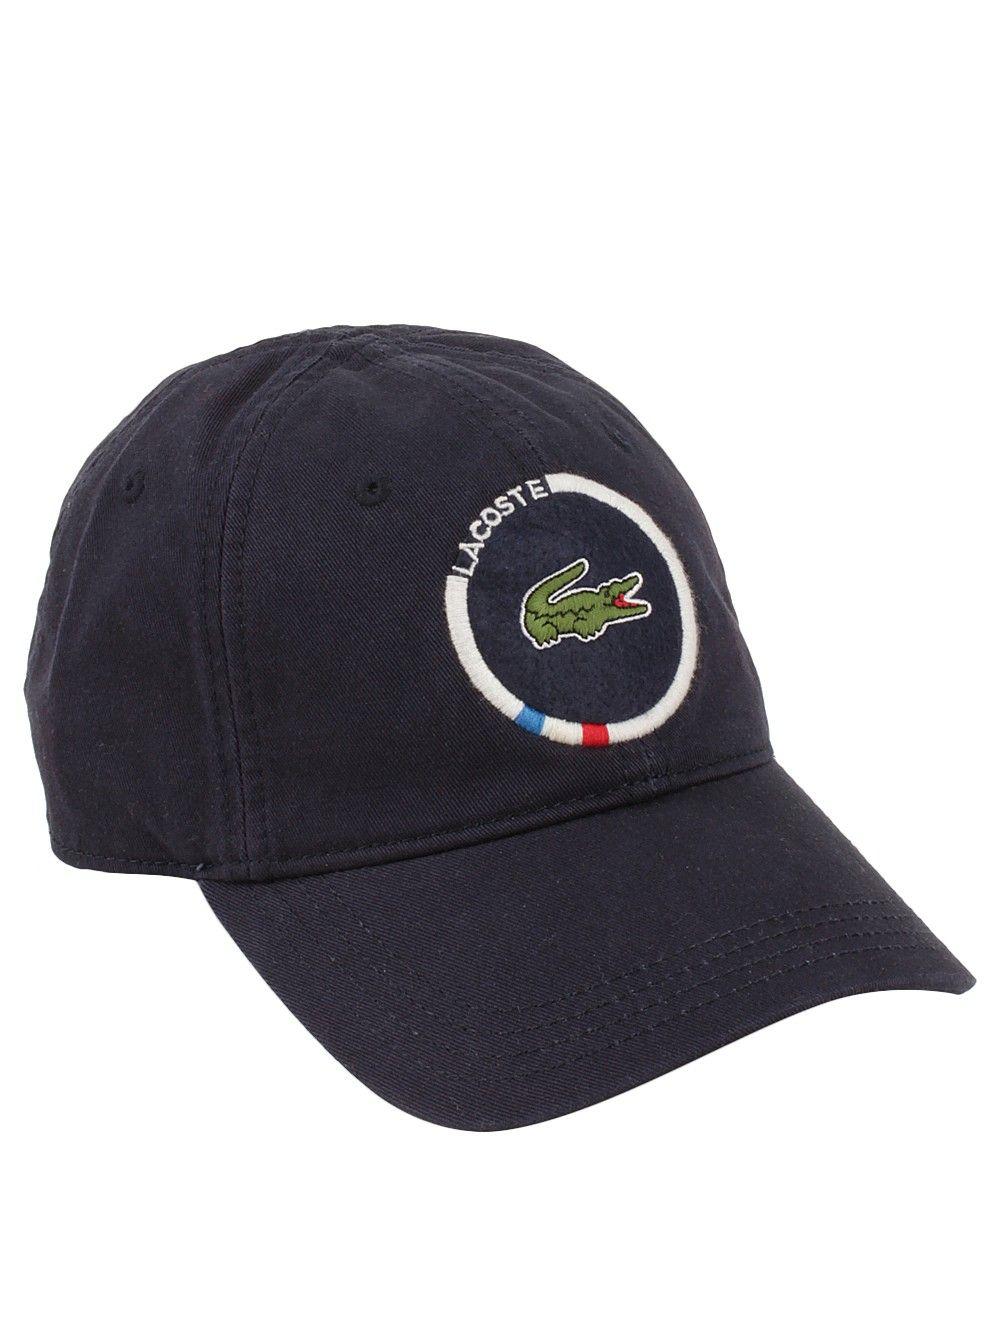 dbd042b556f Lacoste® Men s Croc Patch Cap in Navy Blue Lacoste Men